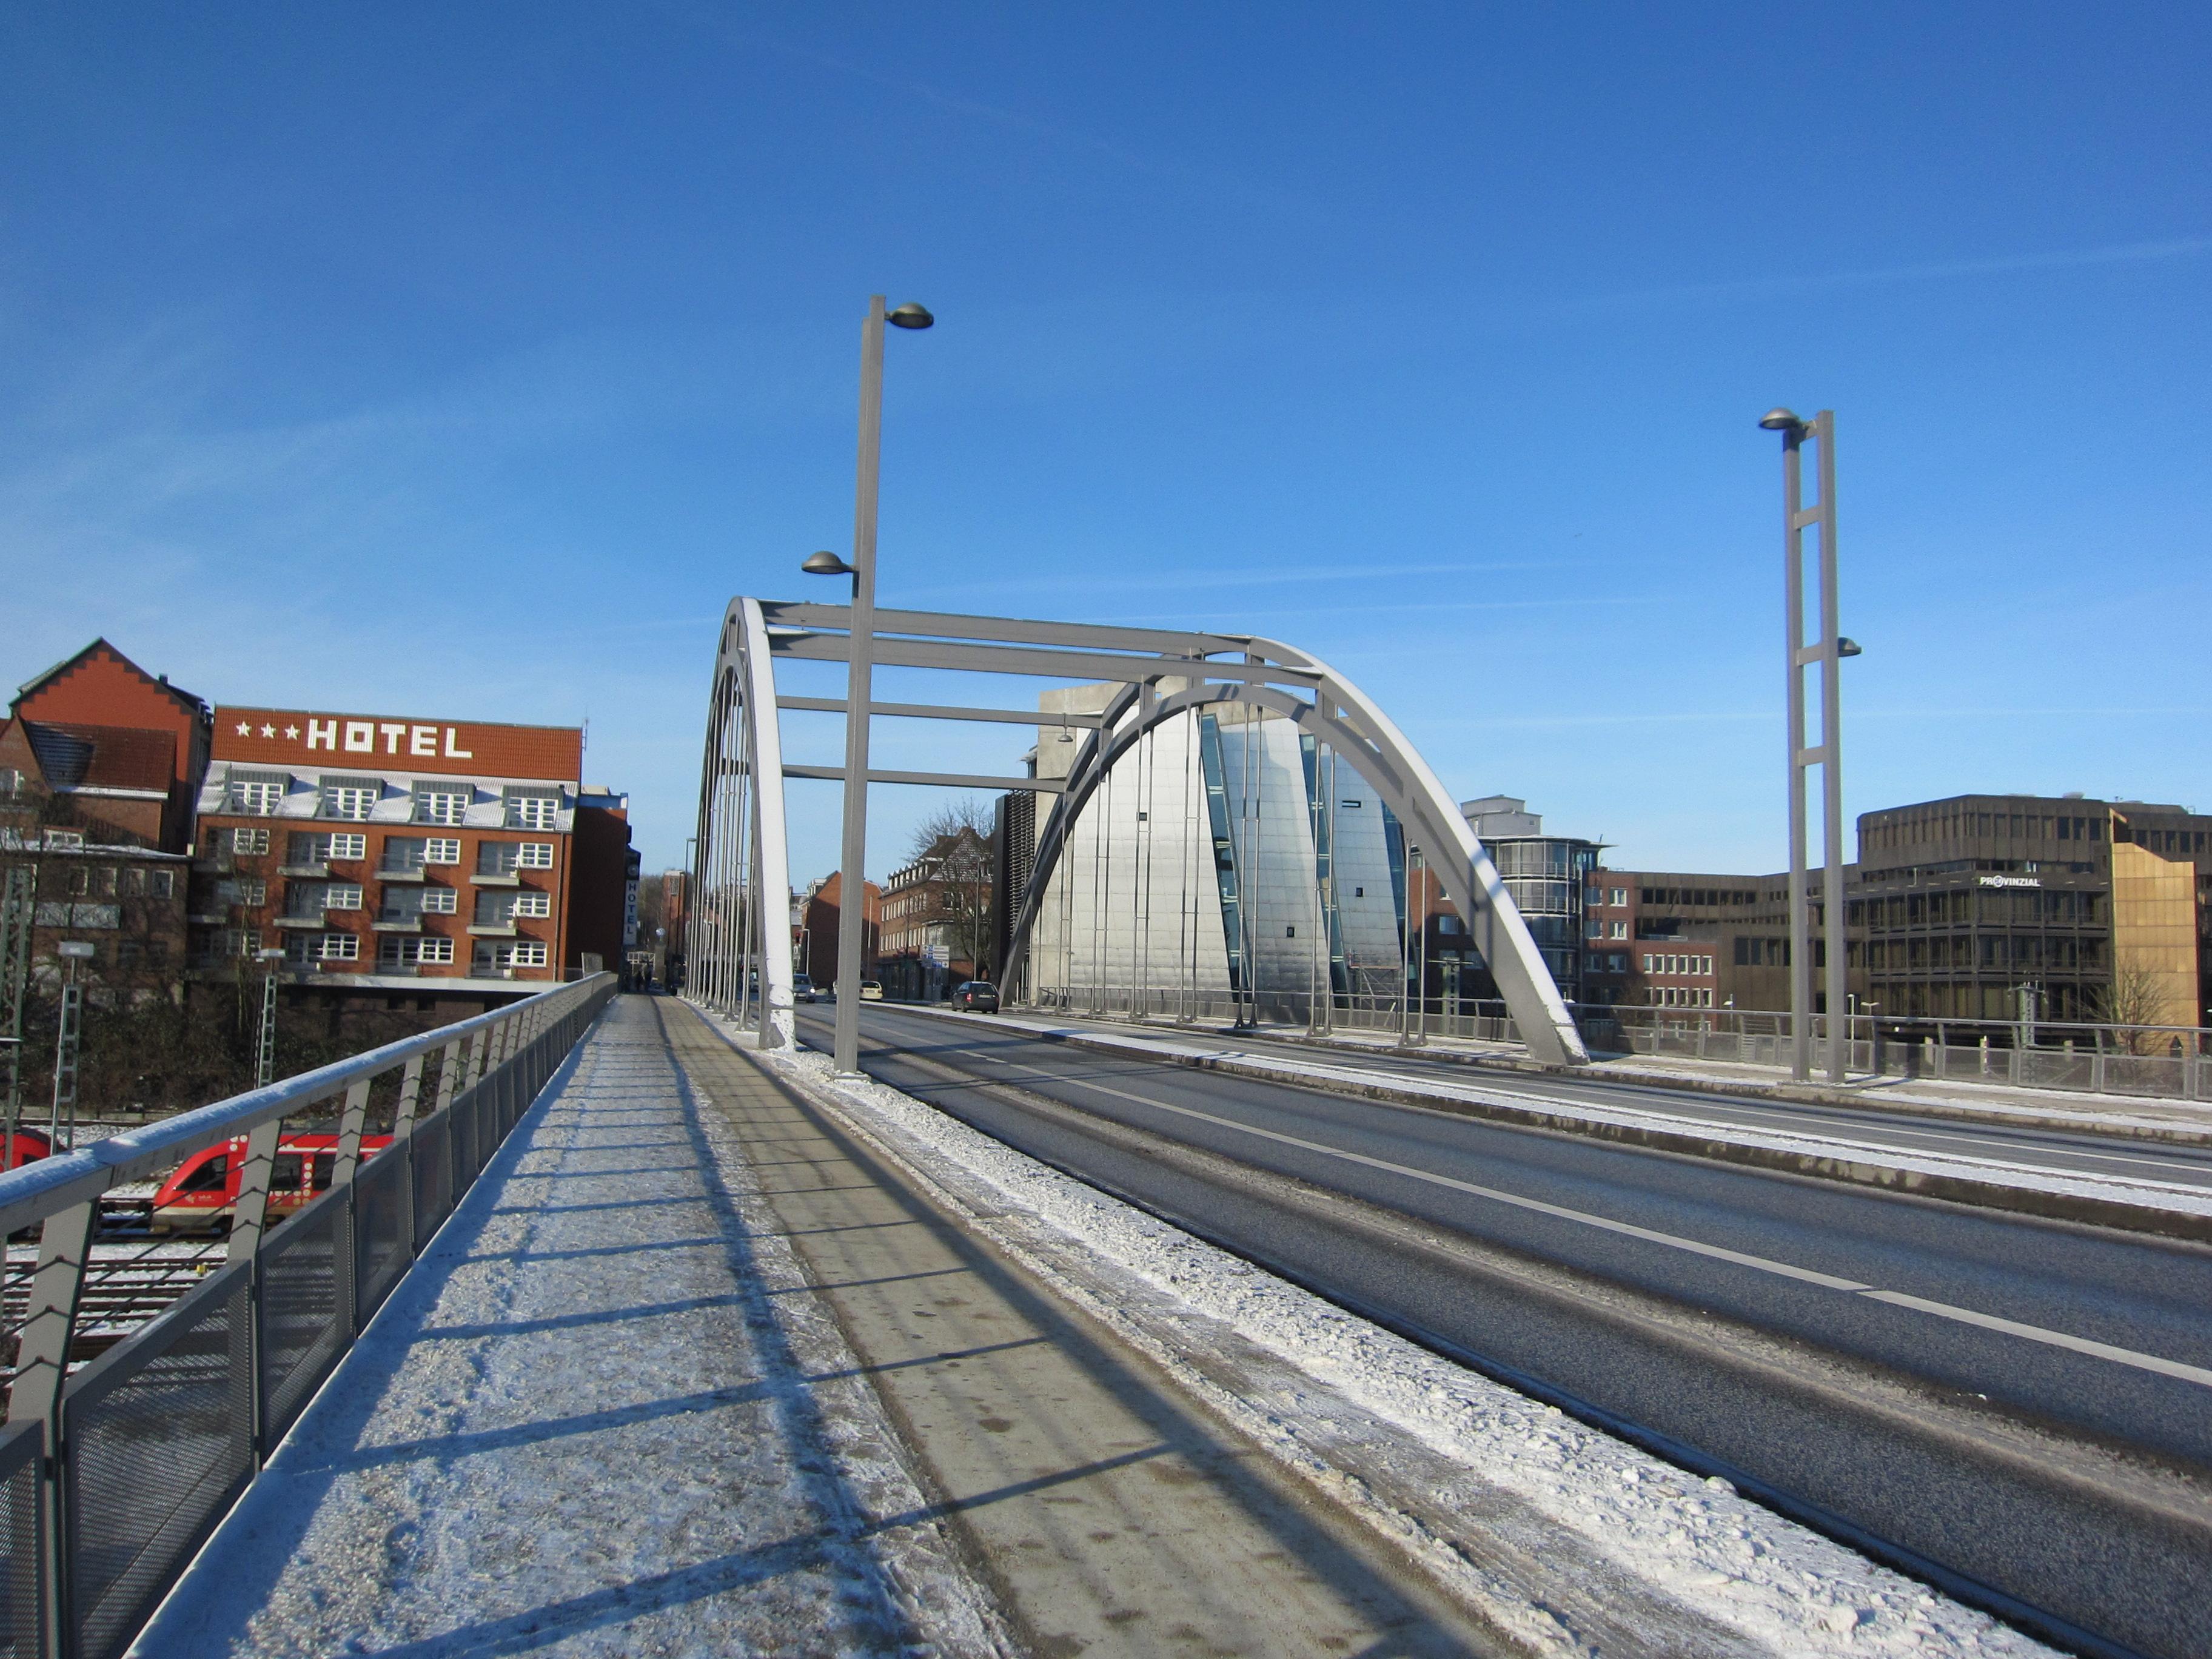 Bogen Gablenzbrücke.jpg